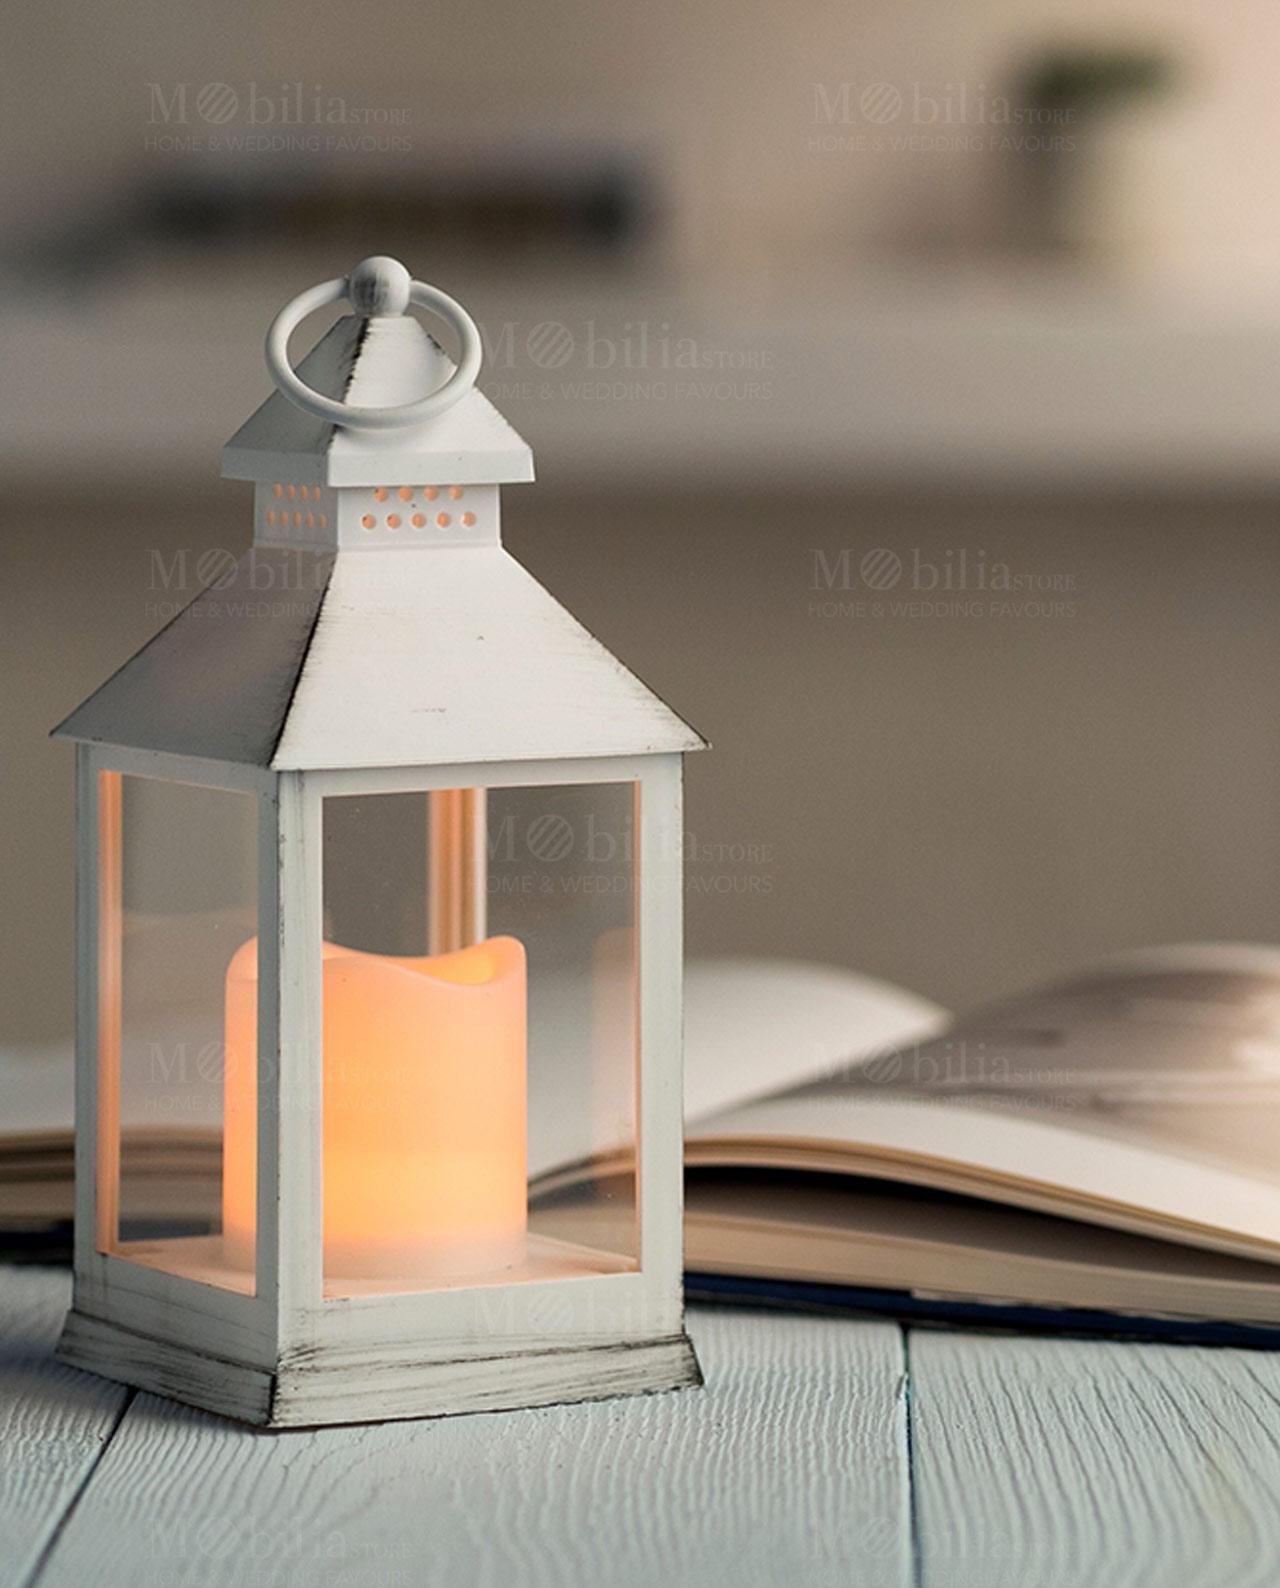 Lanterna Bianca Con Luce Led Assortita Mobilia Store Home Favours